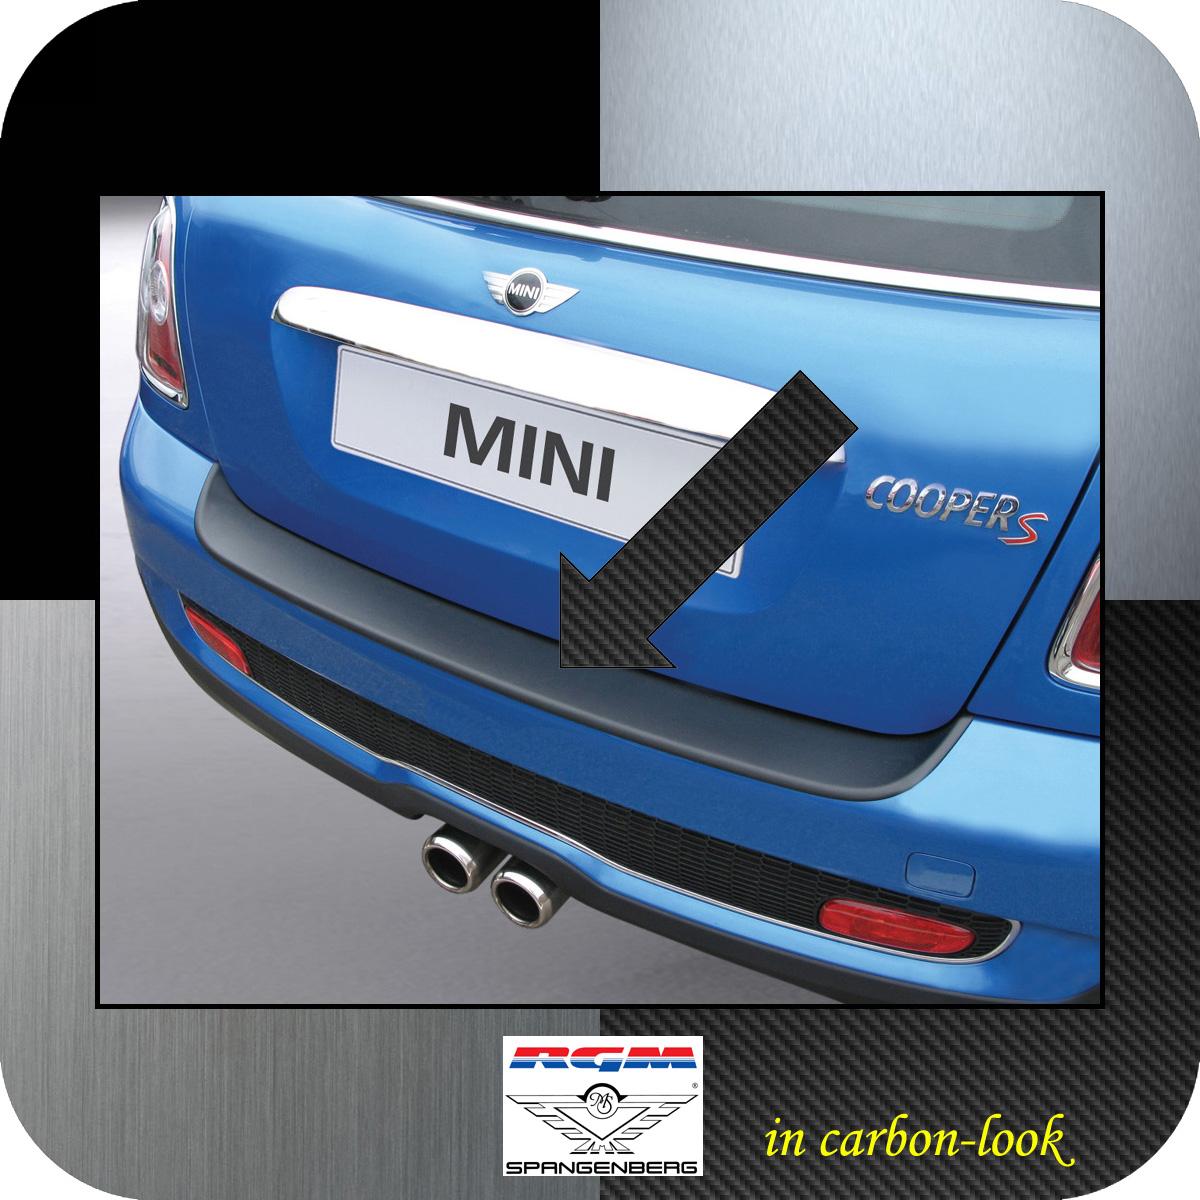 Ladekantenschutz Carbon-Look Mini BMW Coupe Cooper R58 ab Baujahr 2011- 3509102